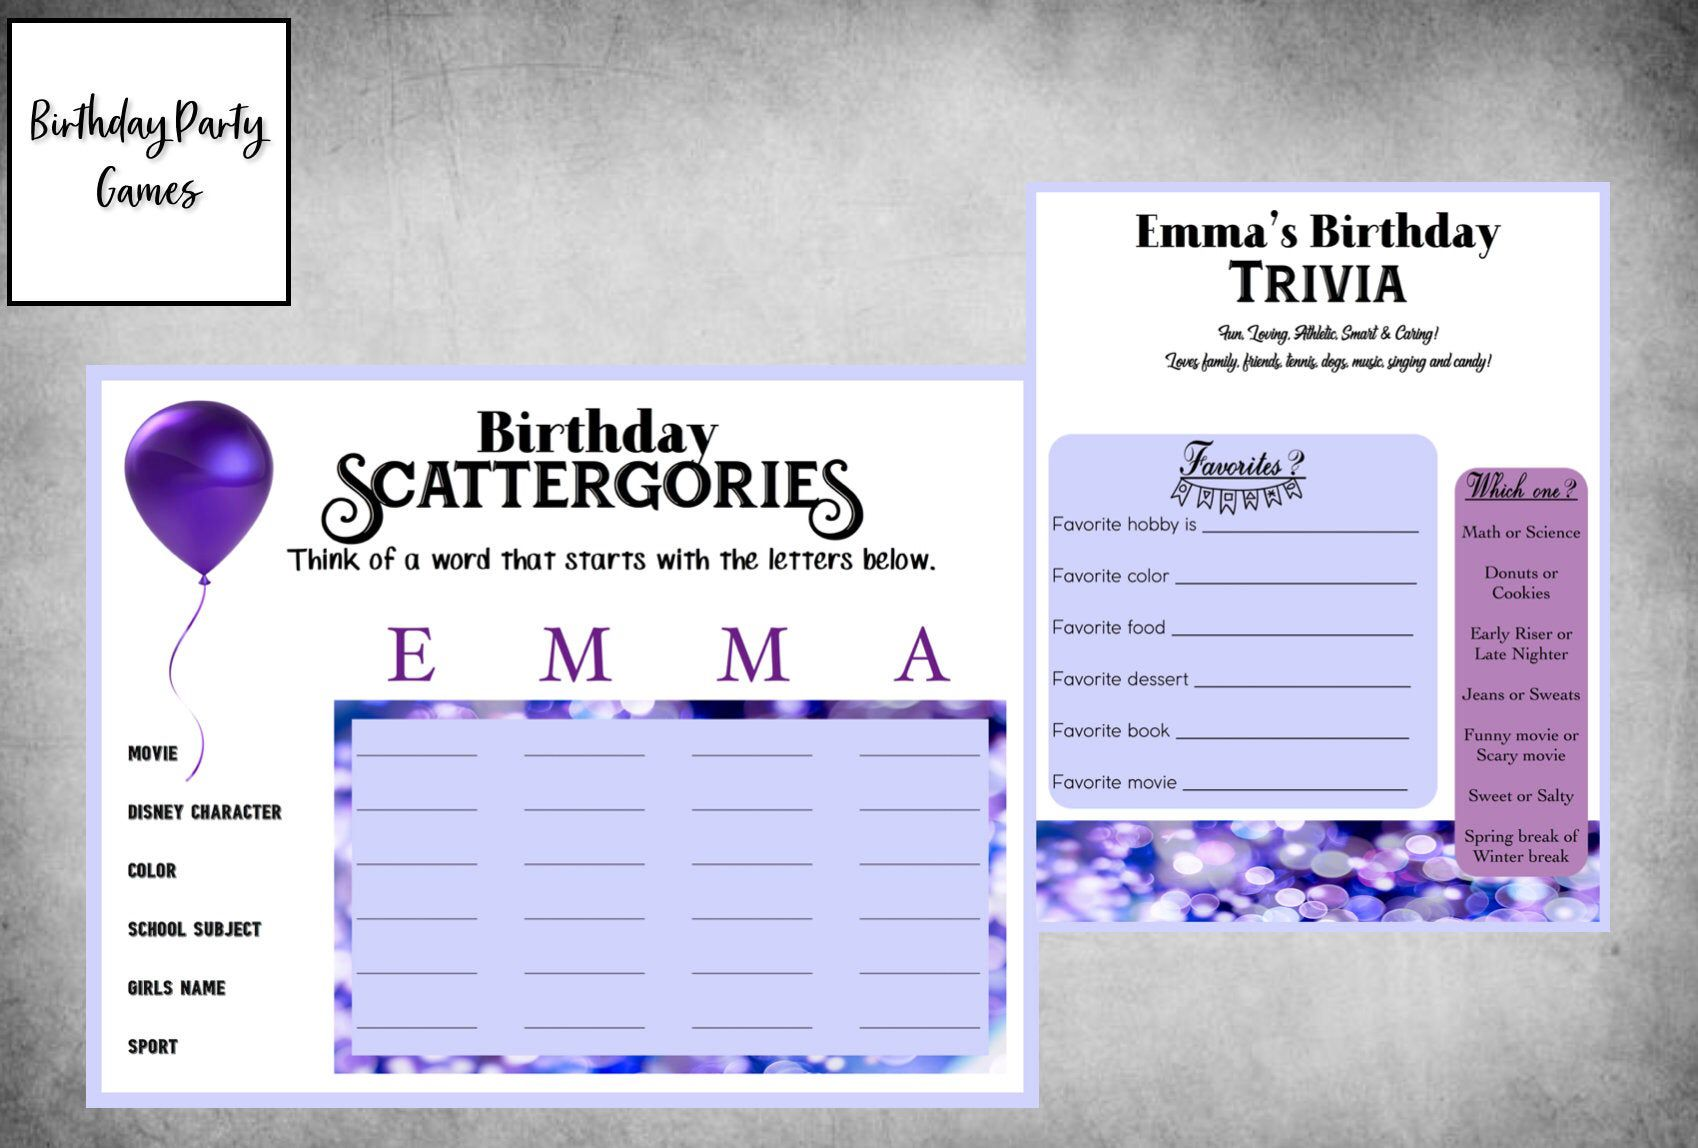 Birthday Party Game Pack 2 Games Scattergories Birthday Etsy In 2021 Birthday Party Games Birthday Games Scattergories